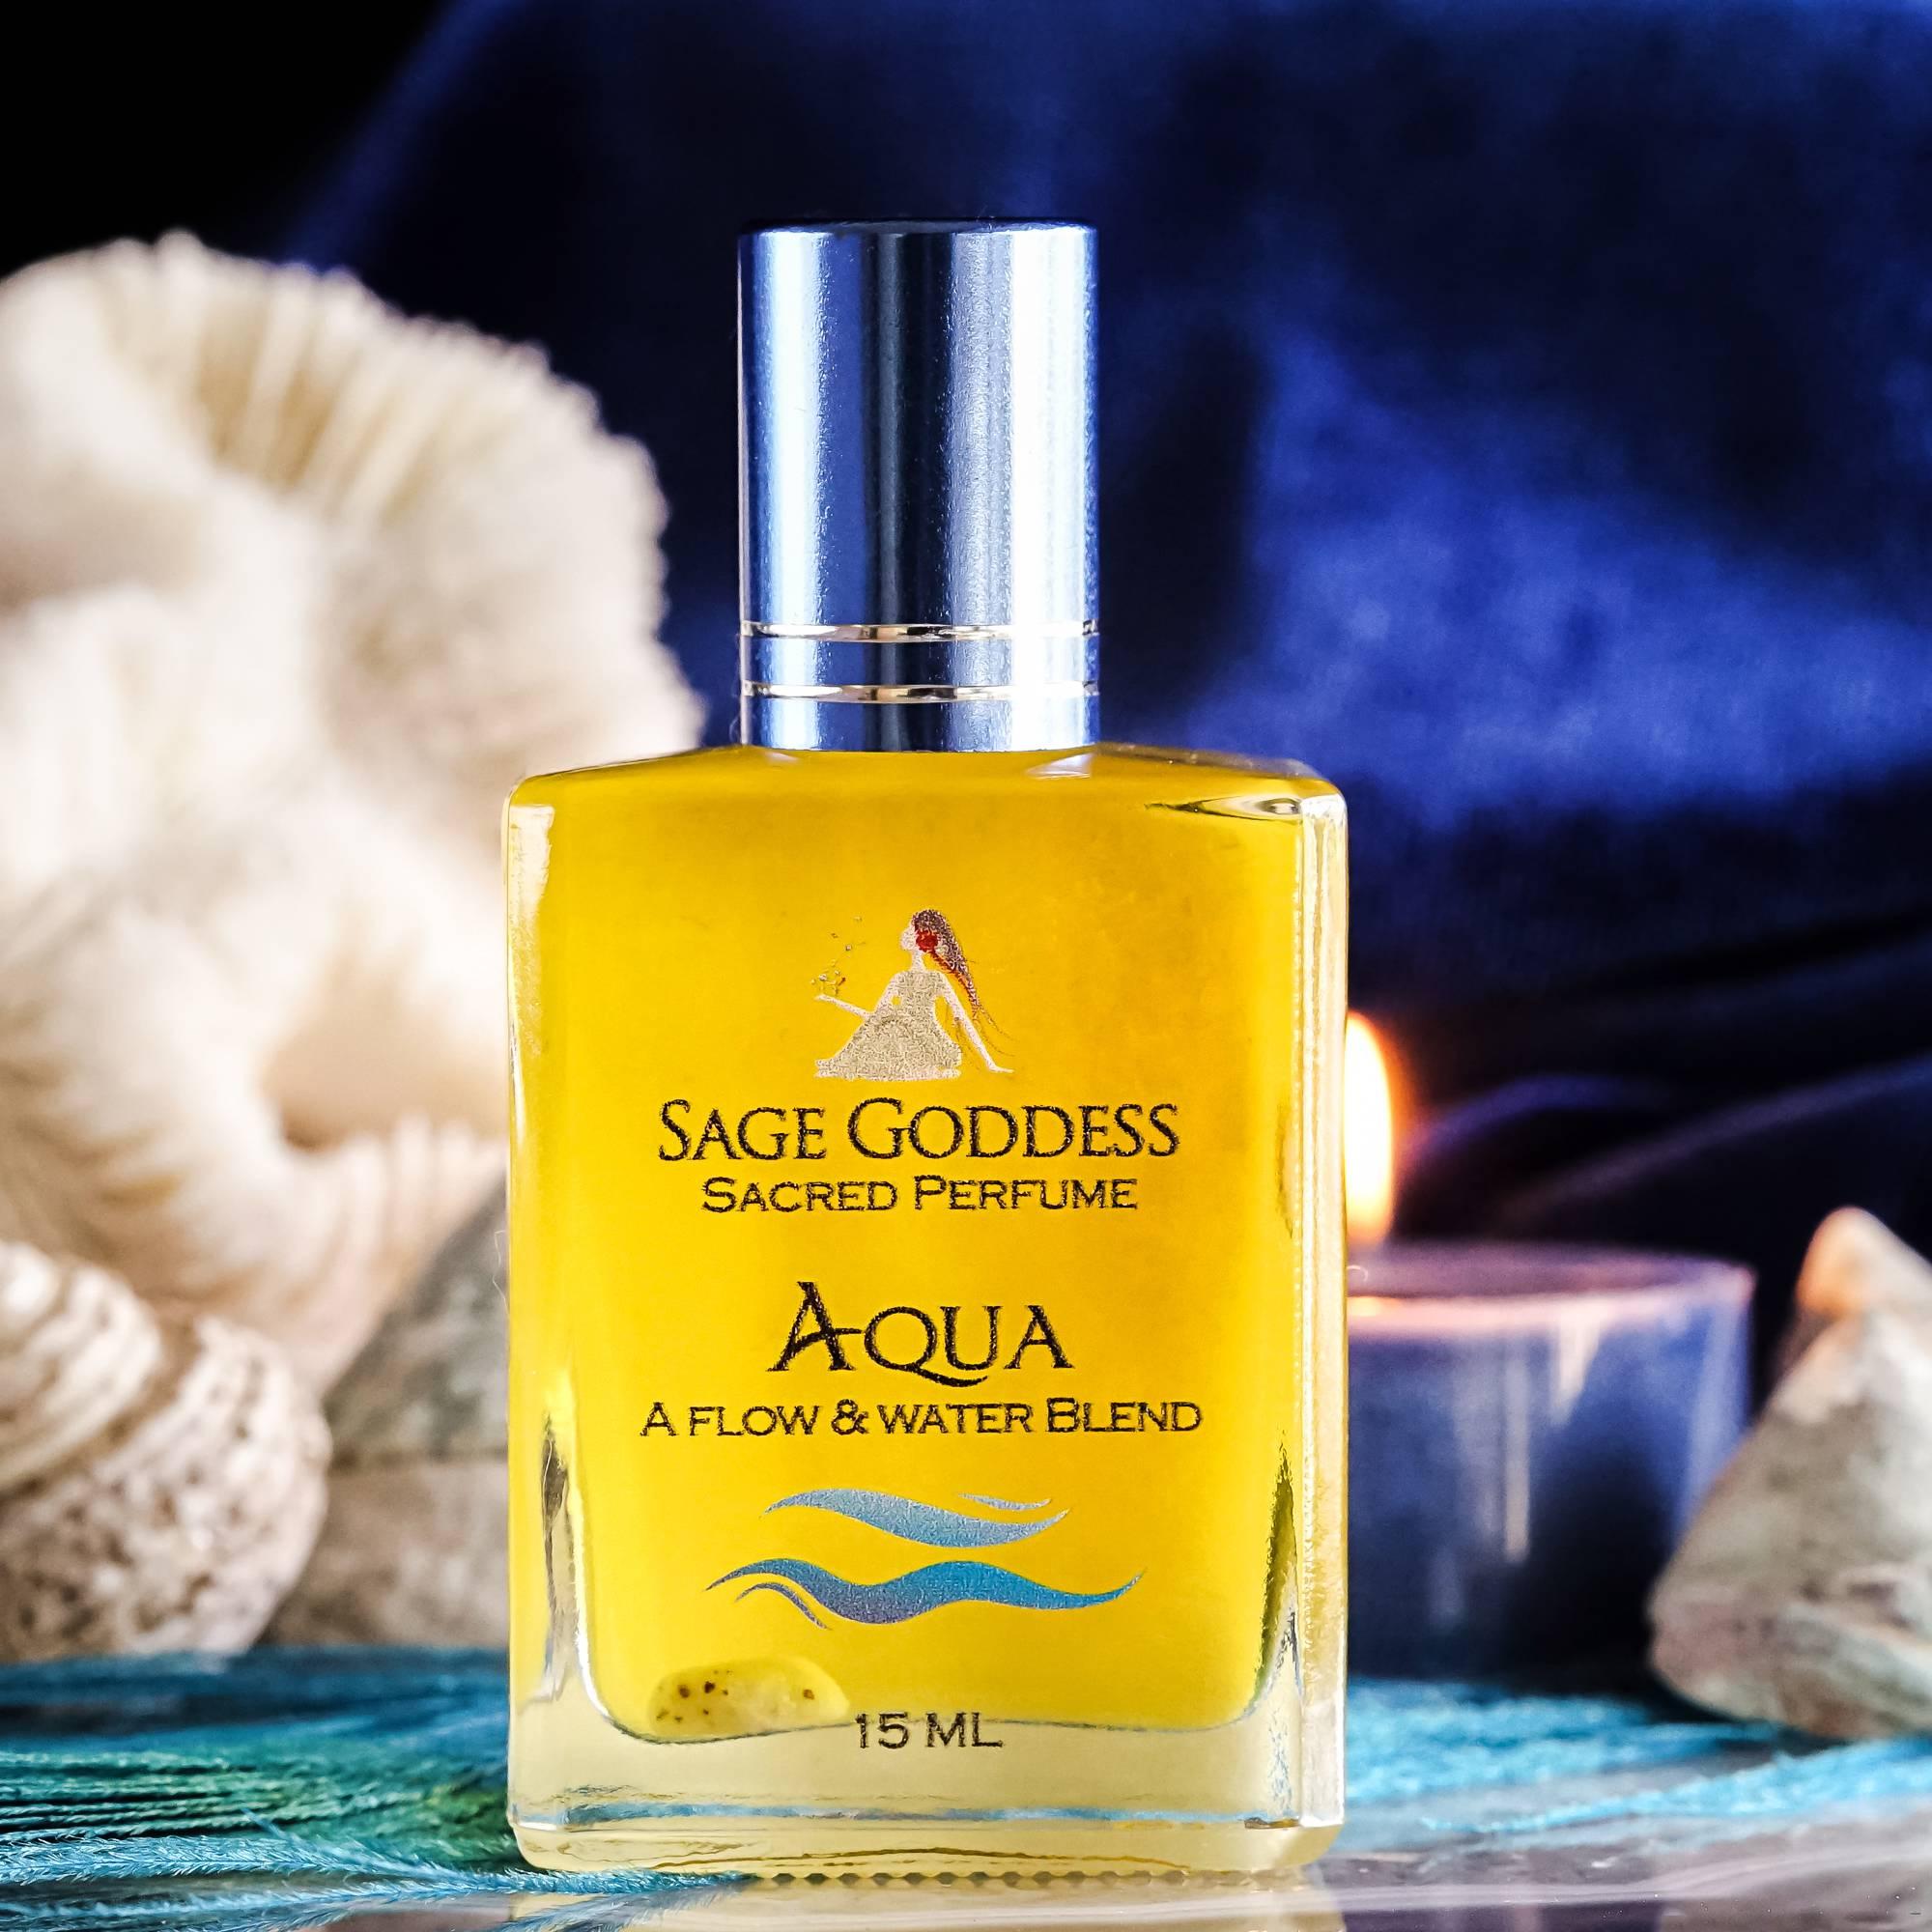 aqua perfume